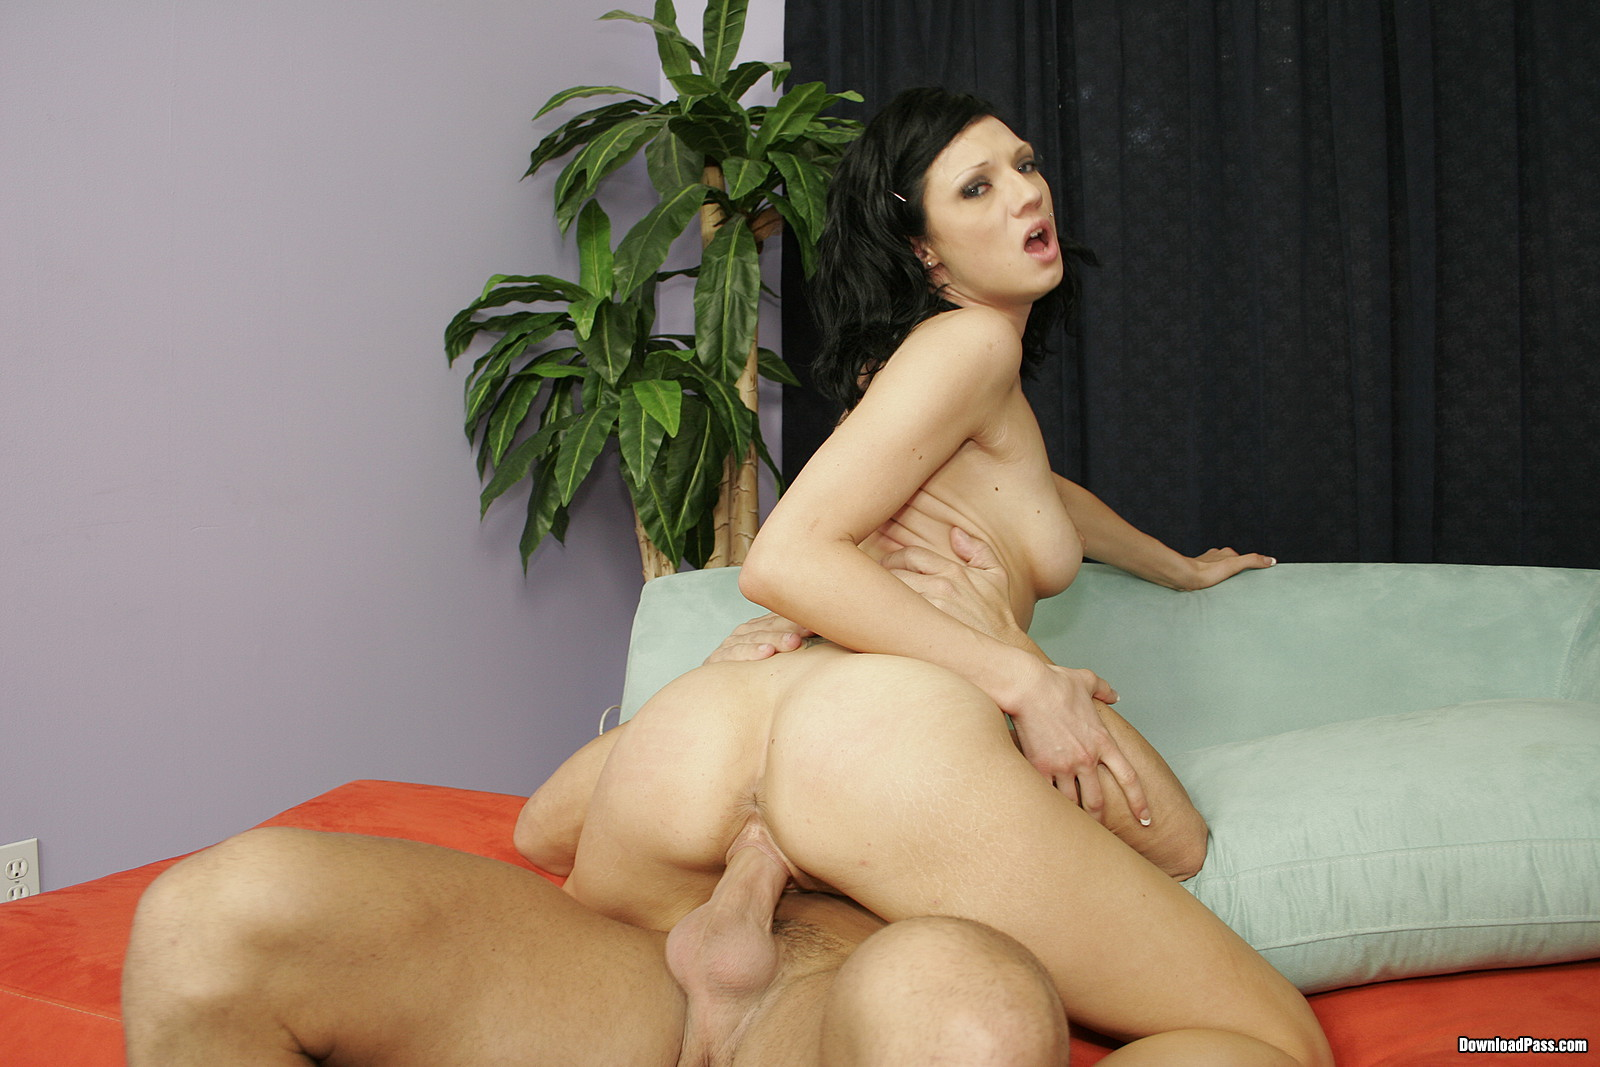 pornofilmi-s-ava-rouz-smotret